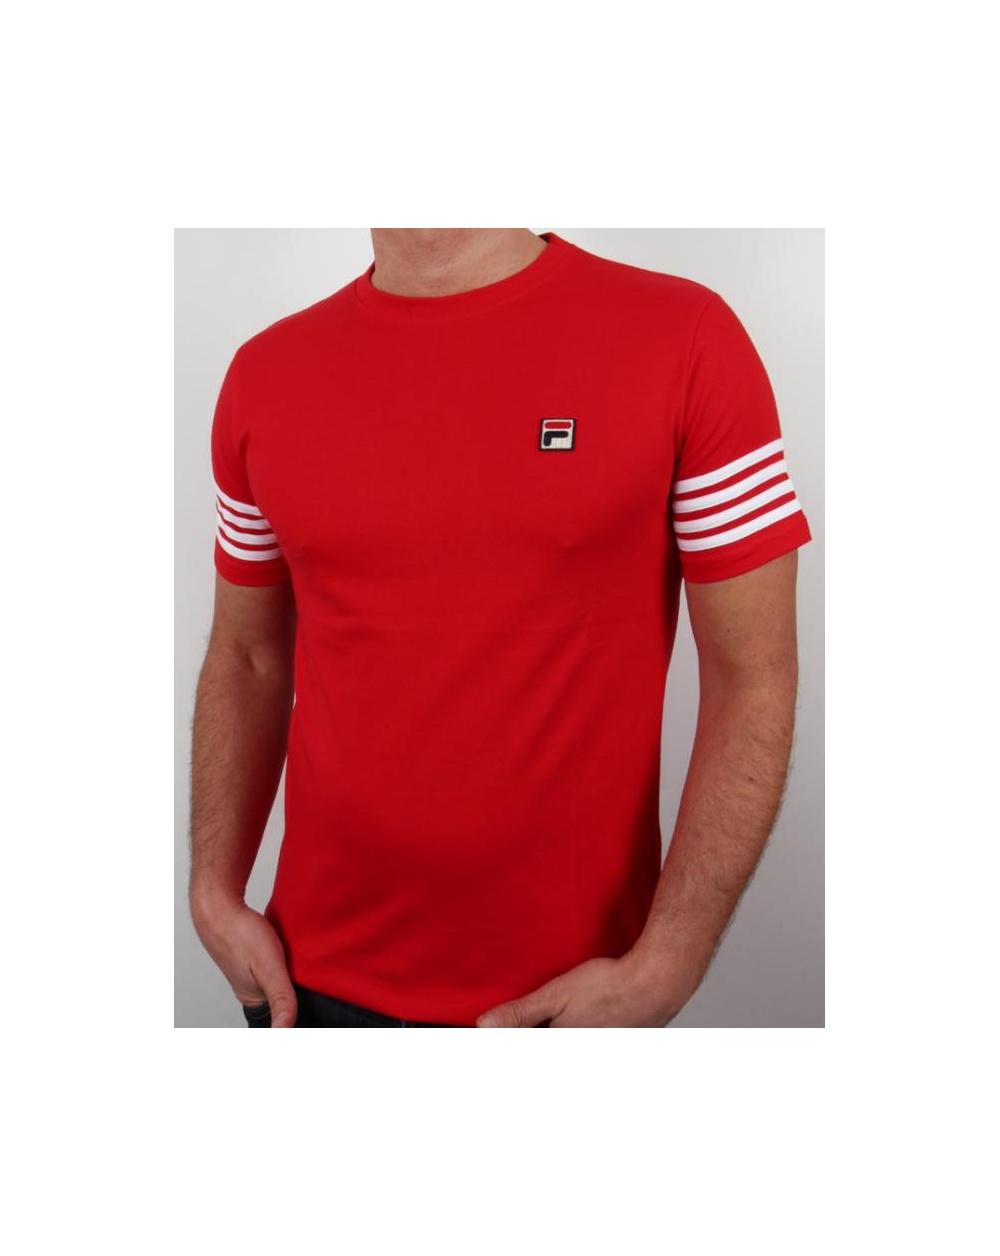 Striped Tee Shirt Mens